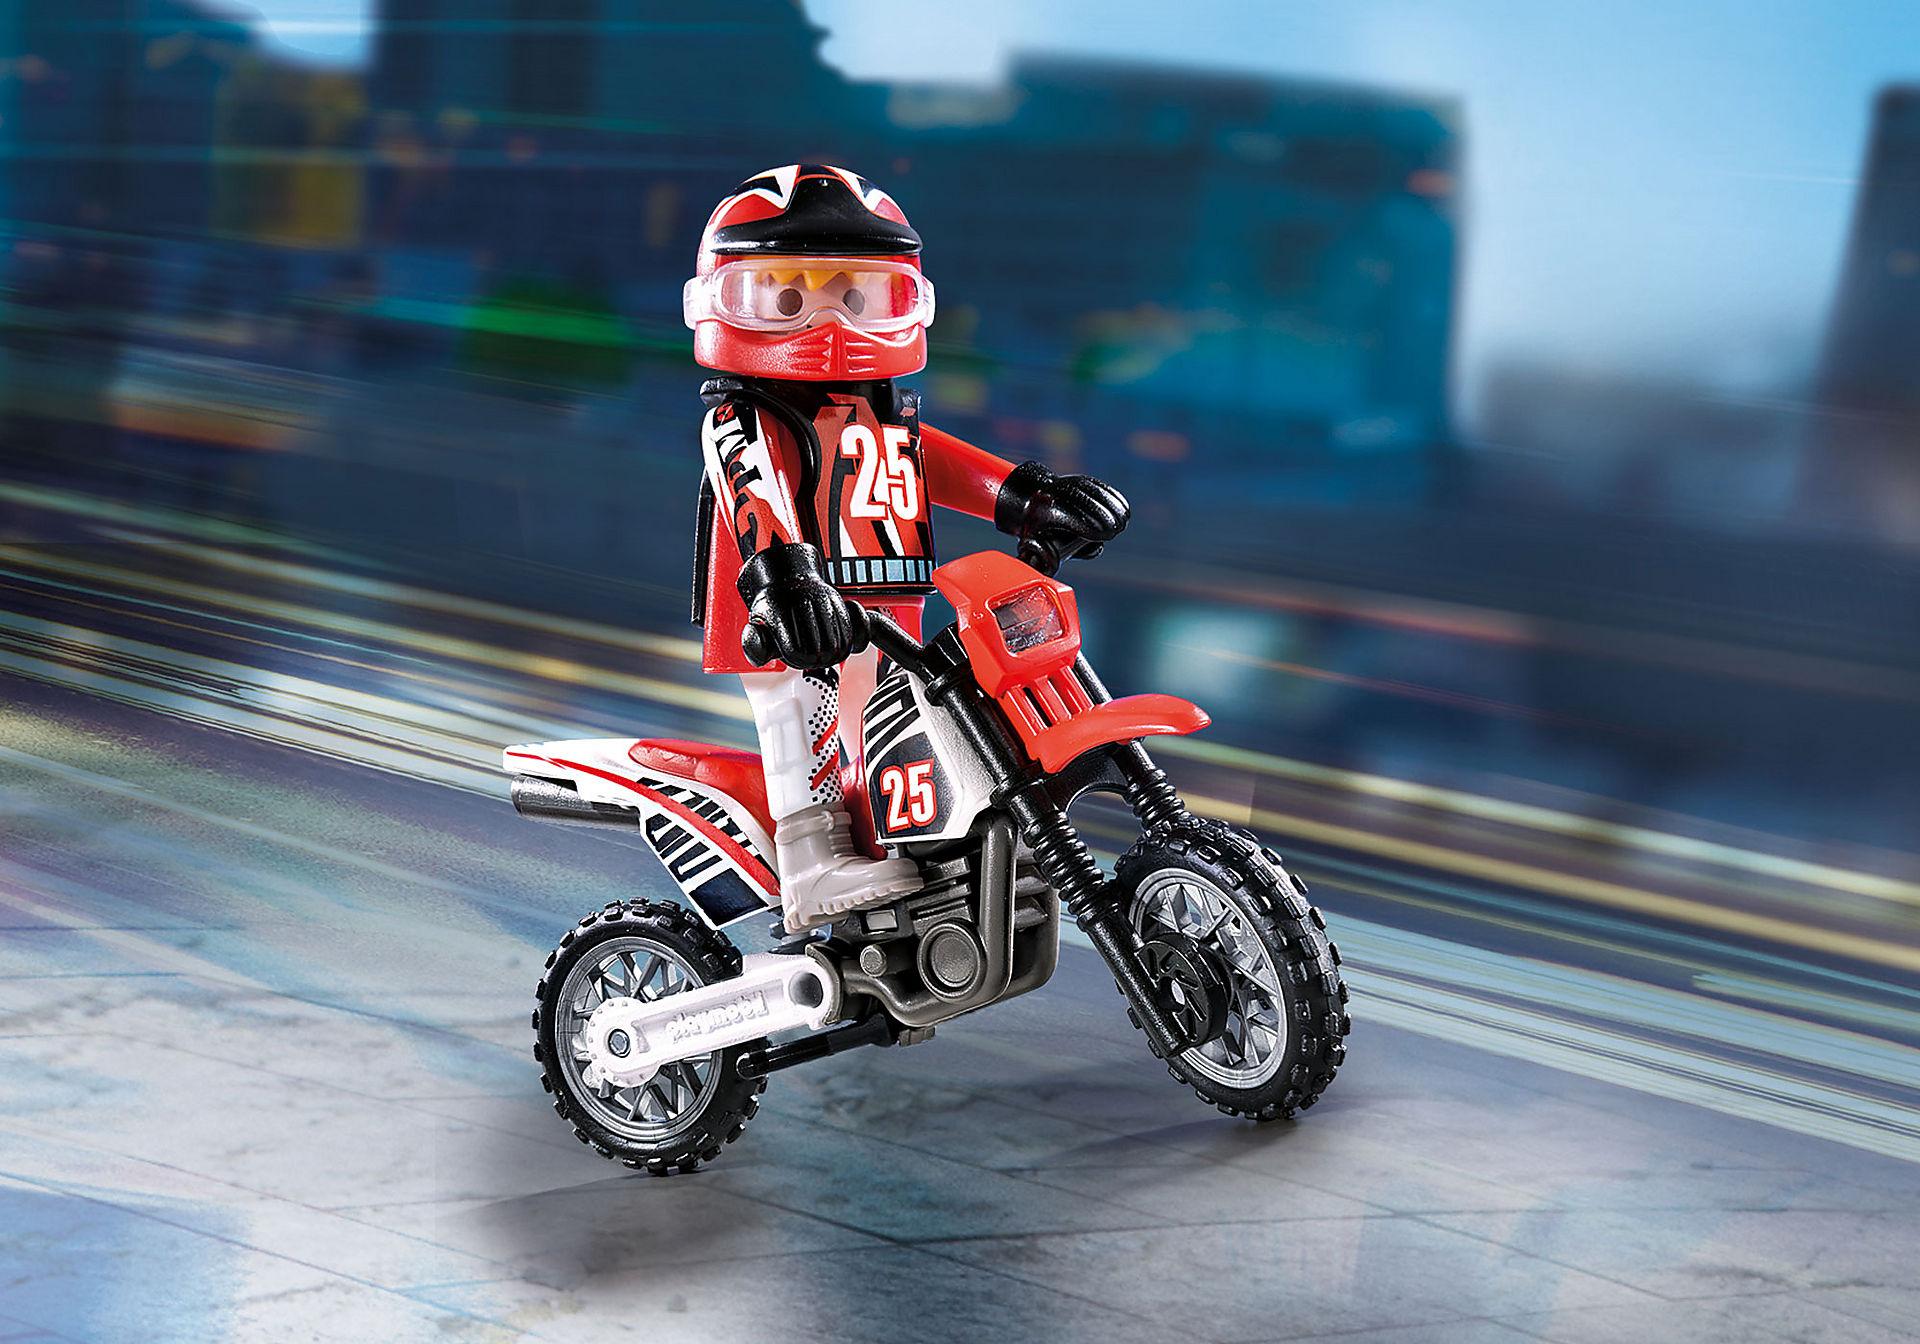 http://media.playmobil.com/i/playmobil/9357_product_detail/Οδηγός μηχανής motocross